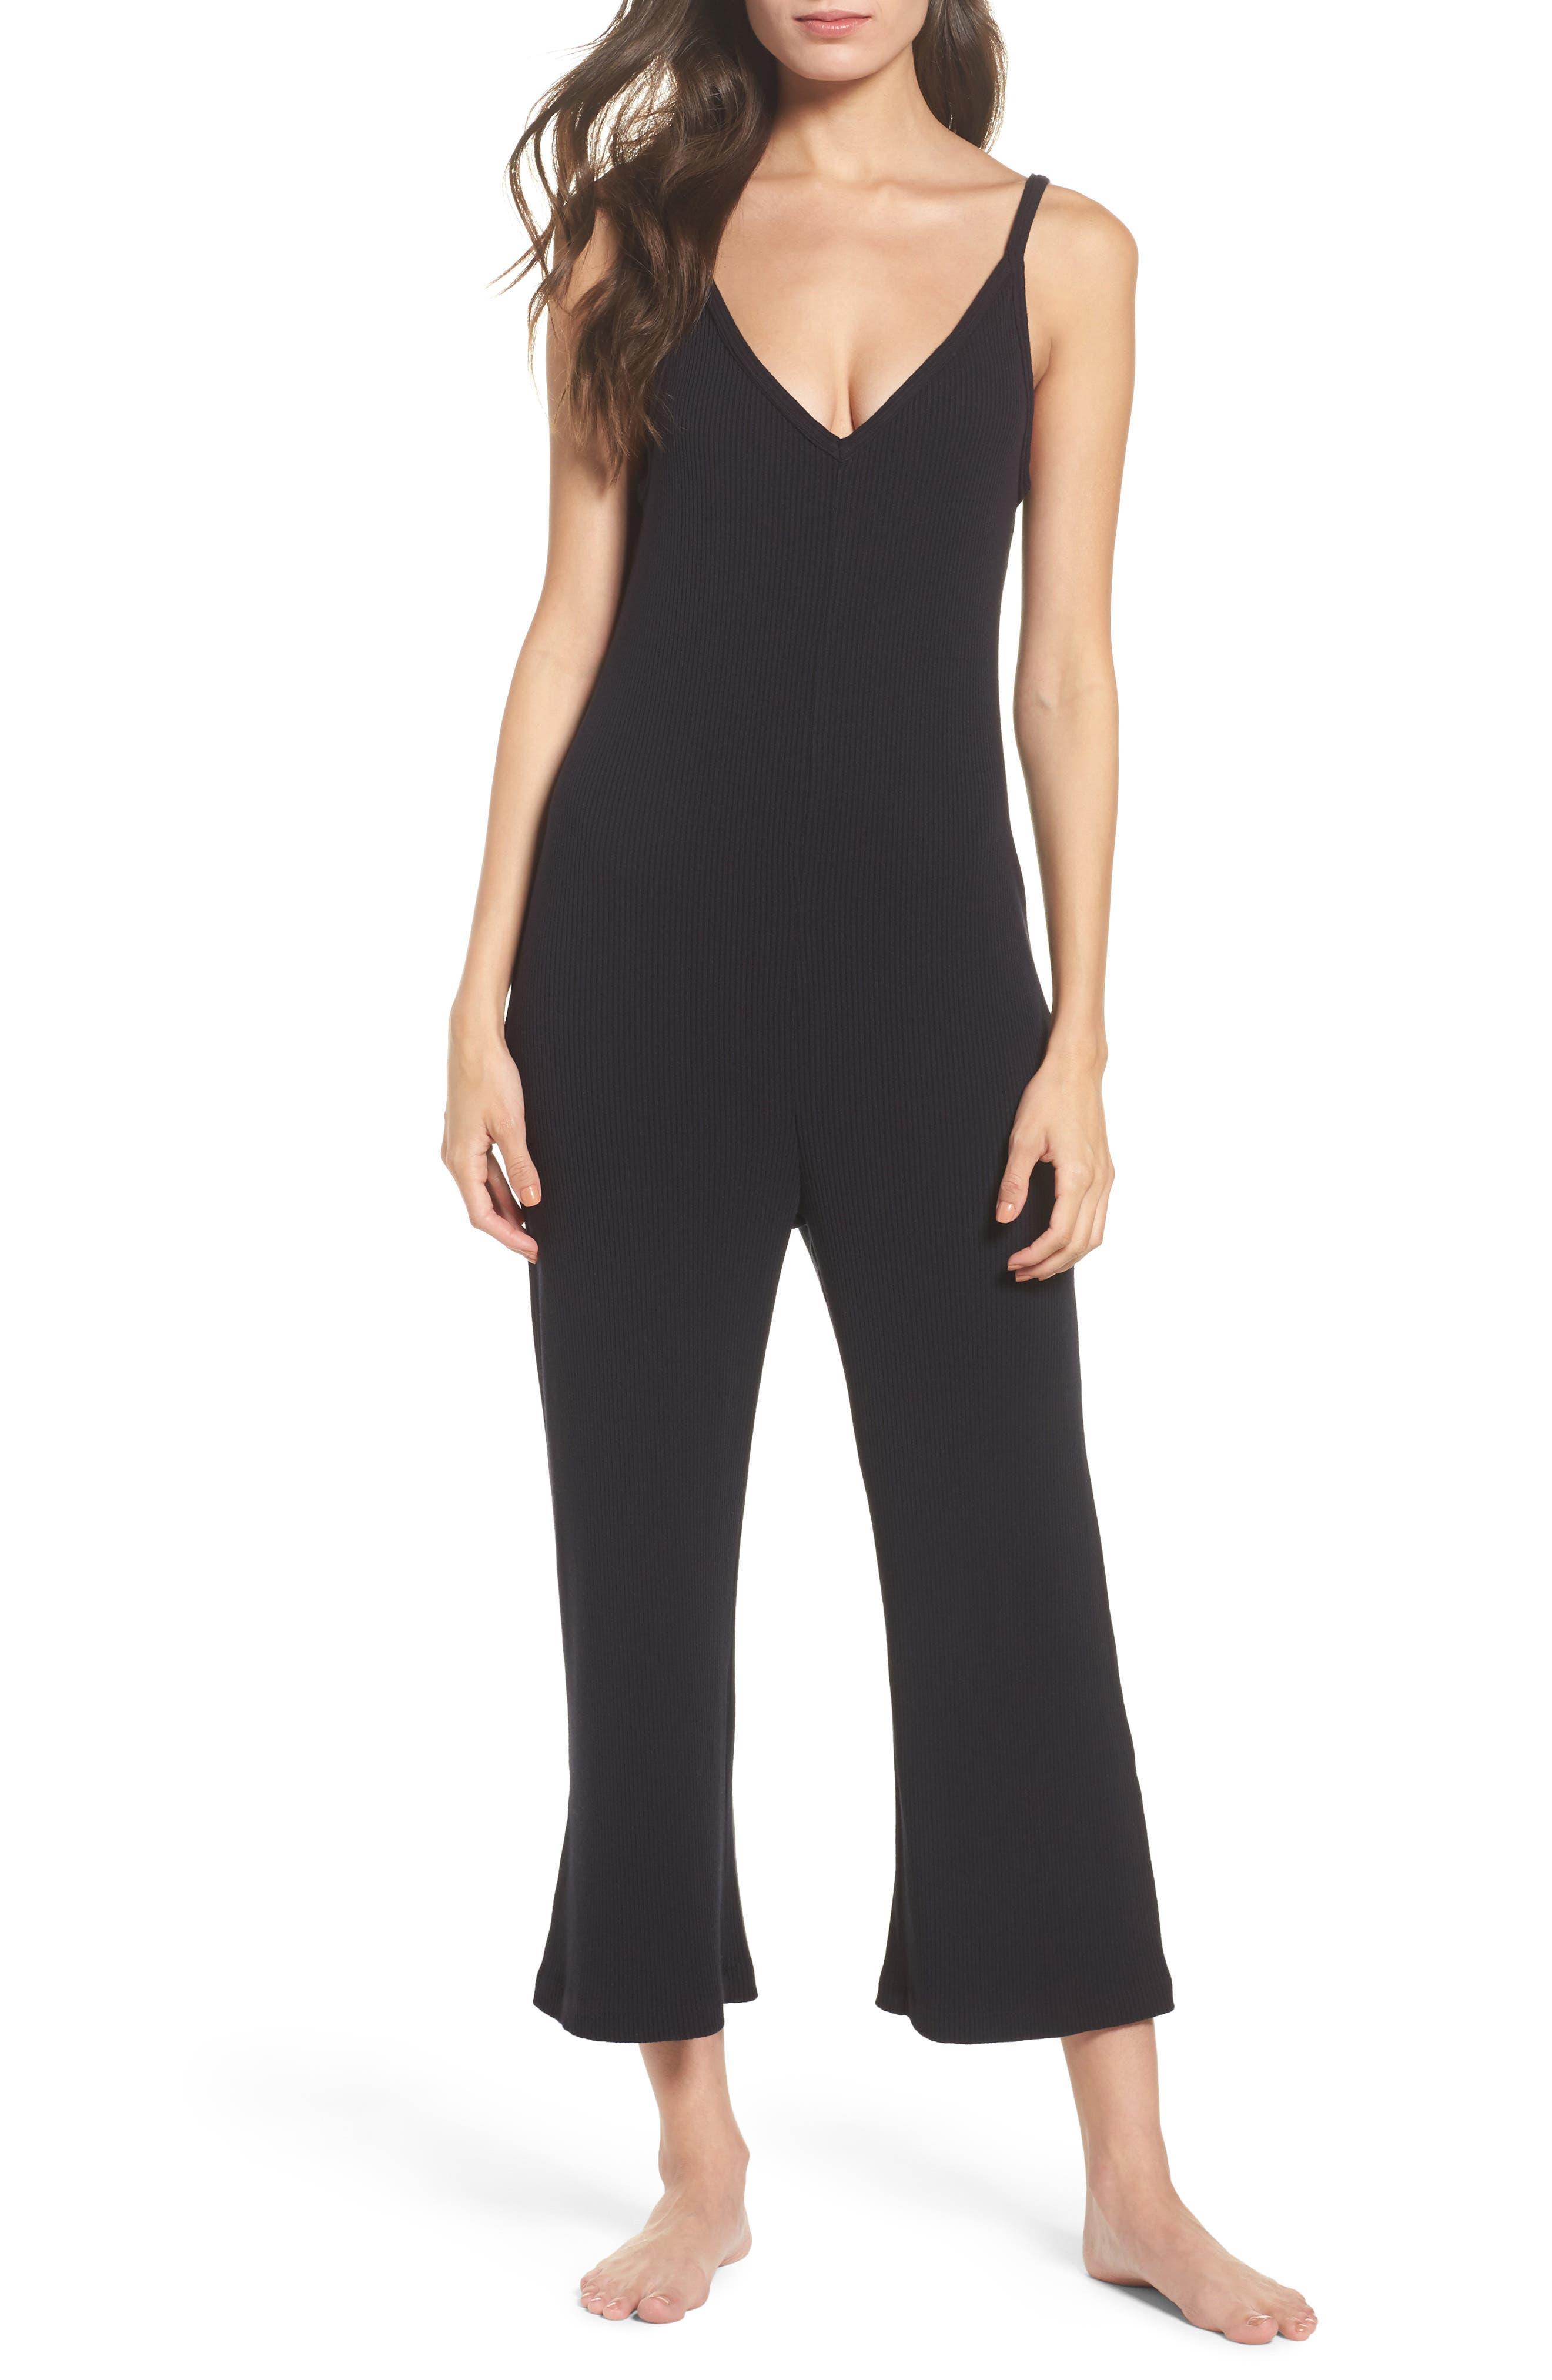 Alternate Image 1 Selected - LACAUSA Naomi Knit Lounge Jumpsuit